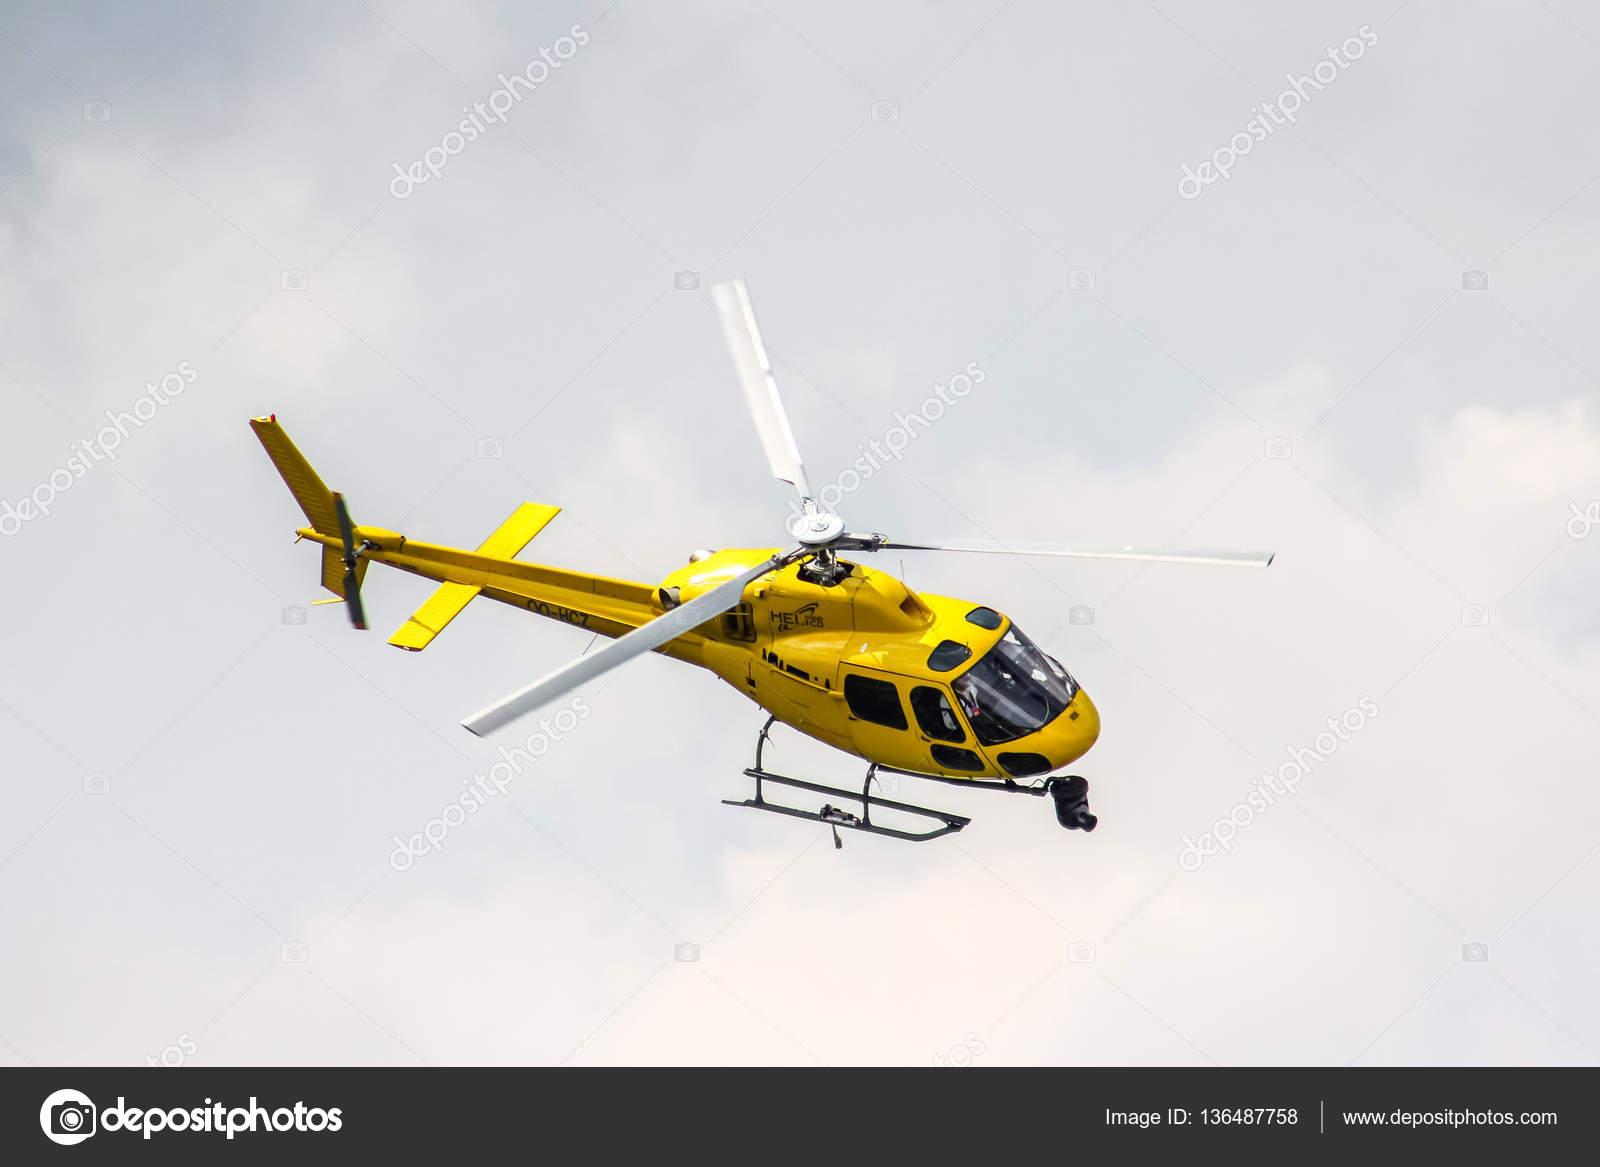 Elicottero 355 : Eurocopter as n ecureuil u foto editoriale stock artzzz